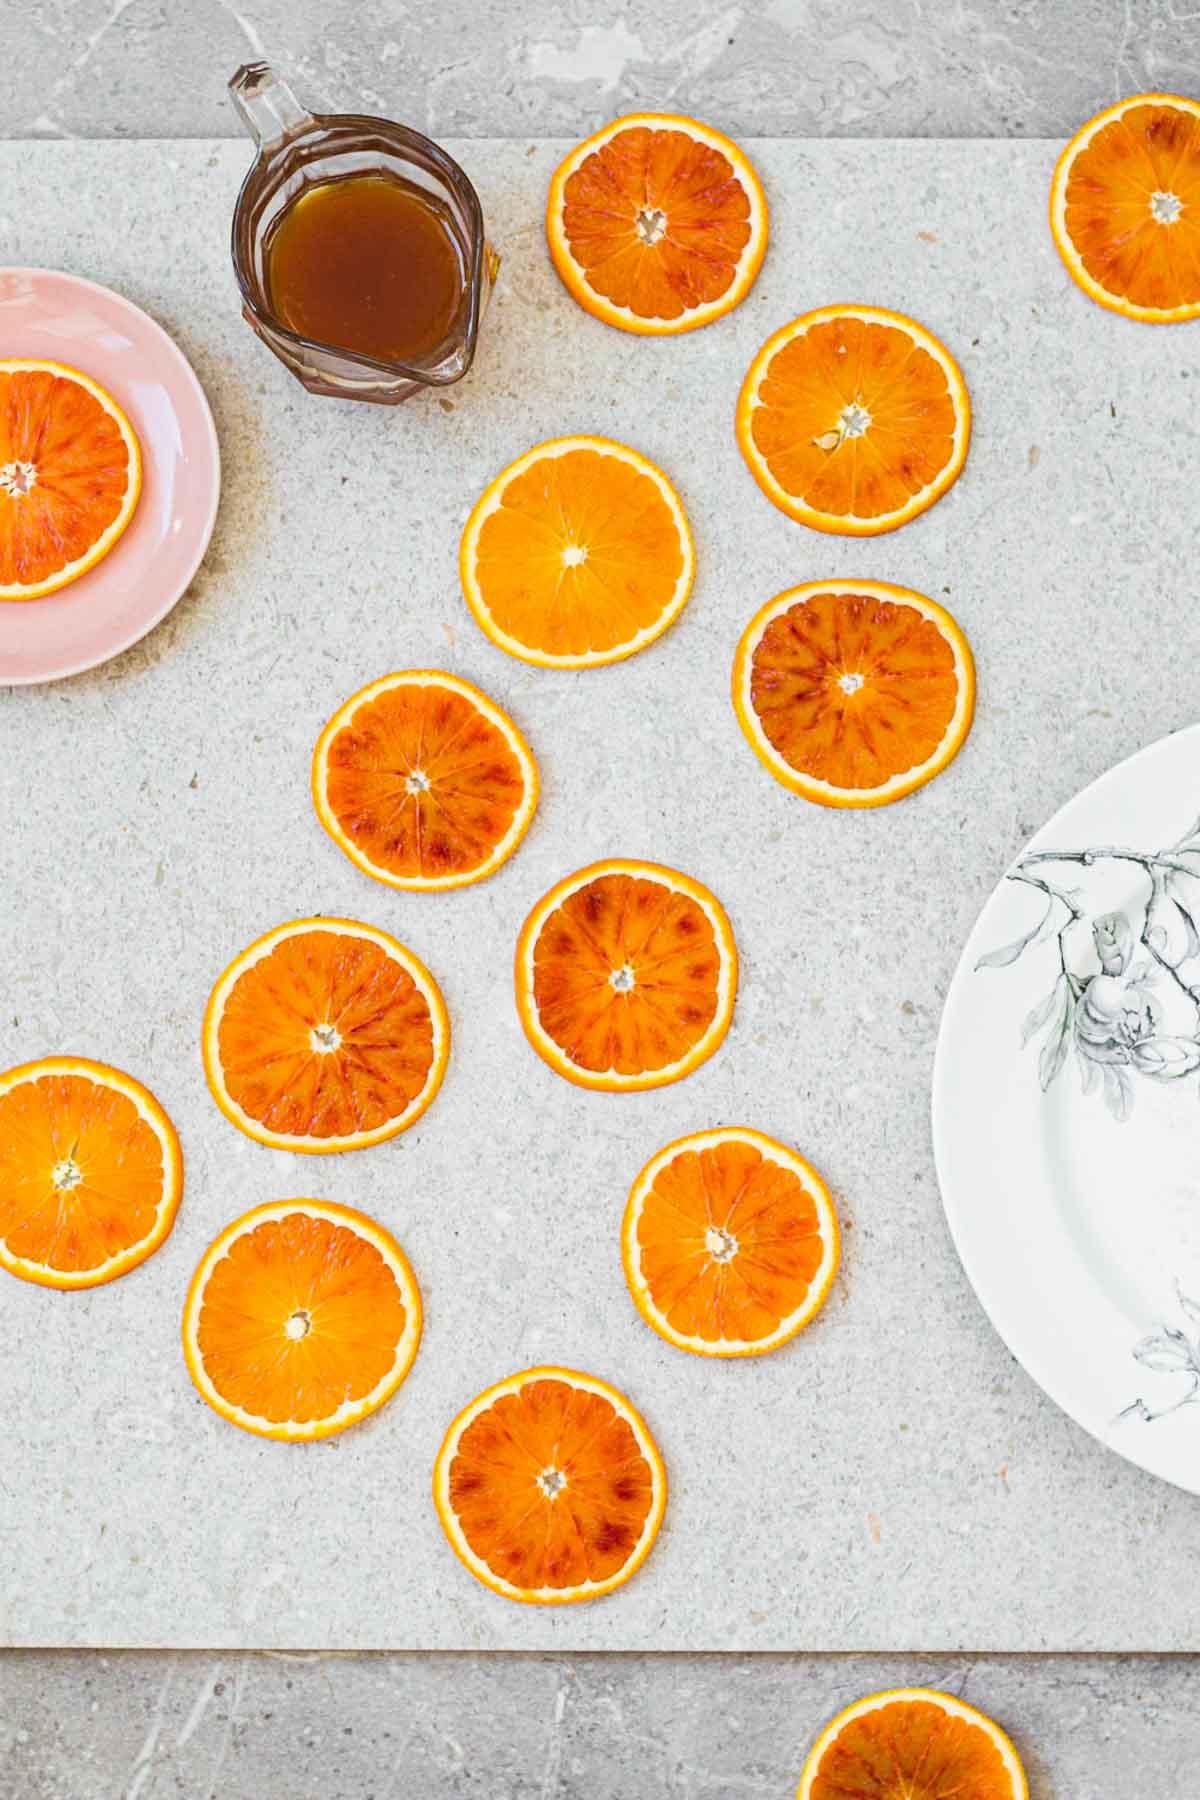 Blood orange syrup for orangeade